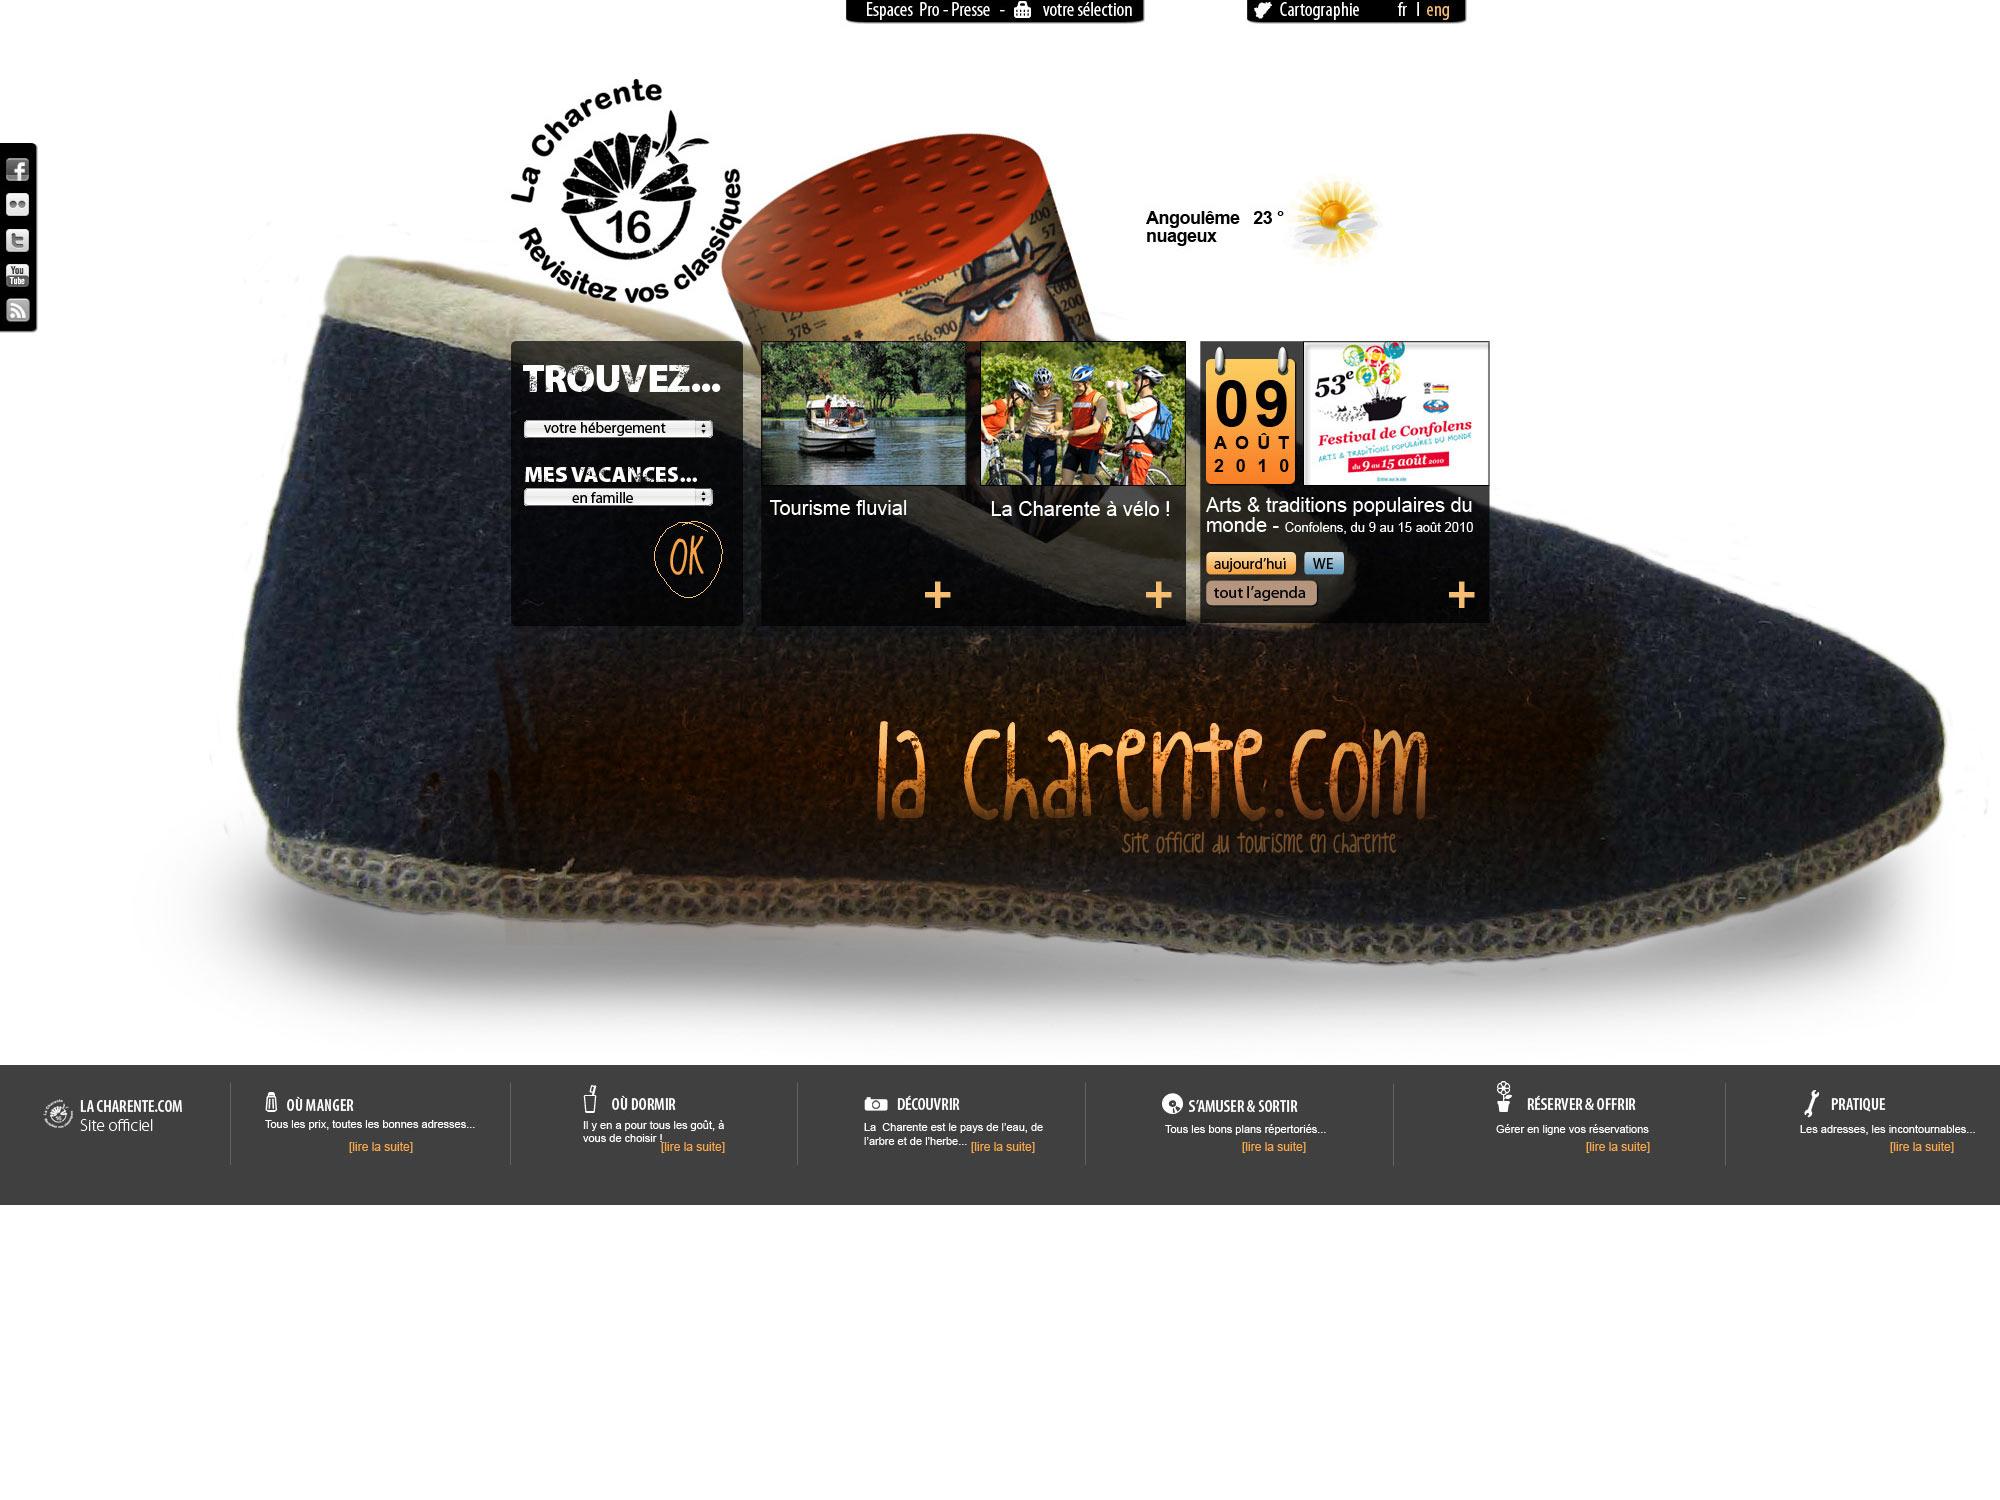 maquette-charente-0408-D1.jpg